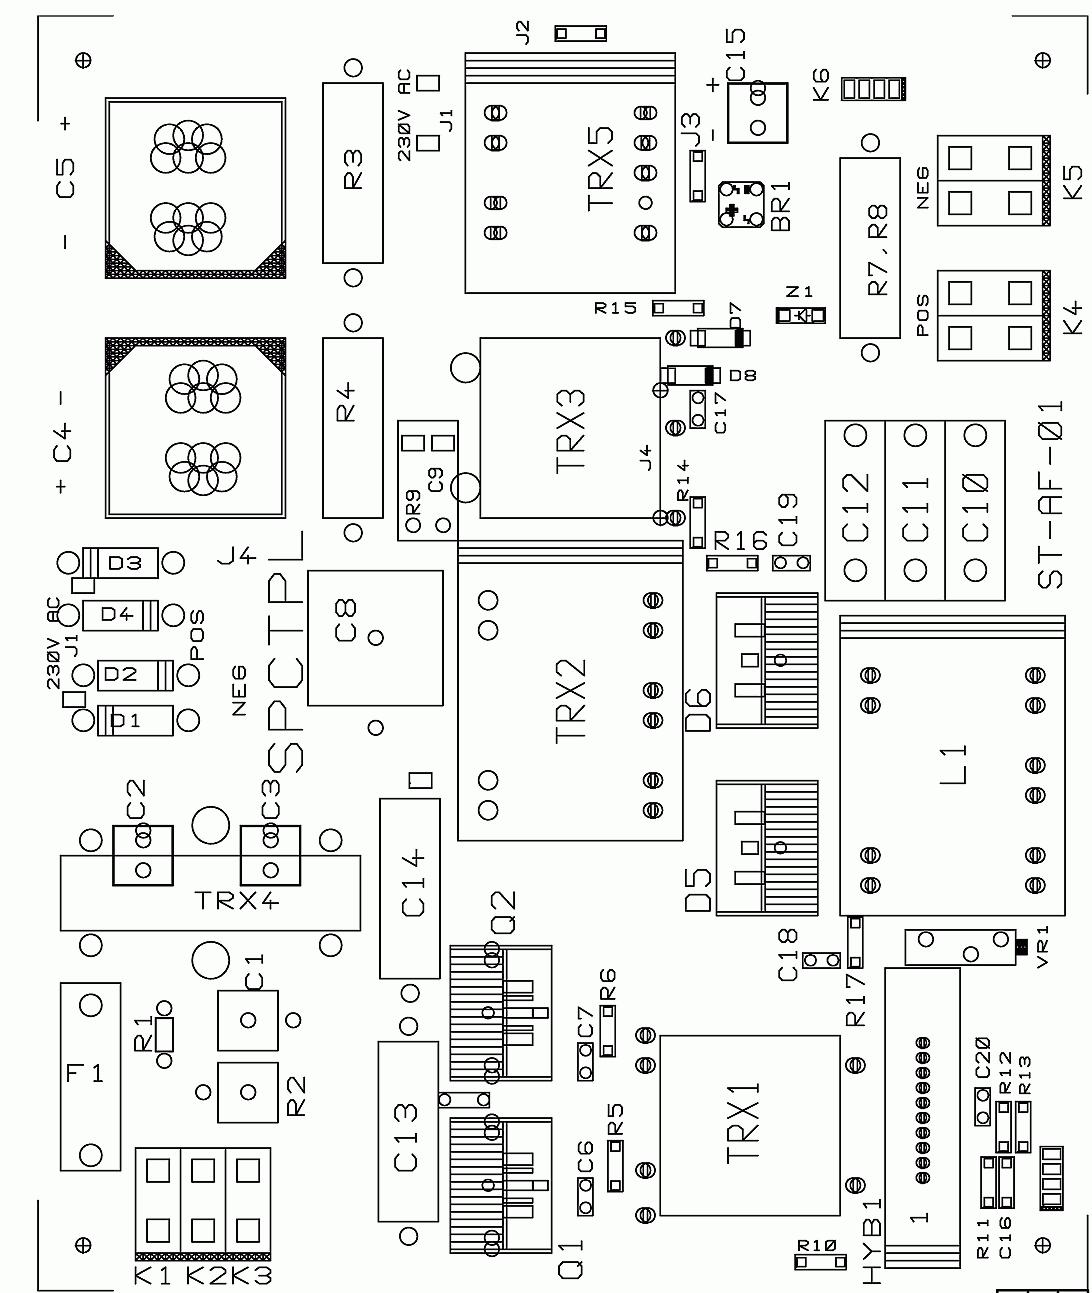 smps archives - delabs schematics